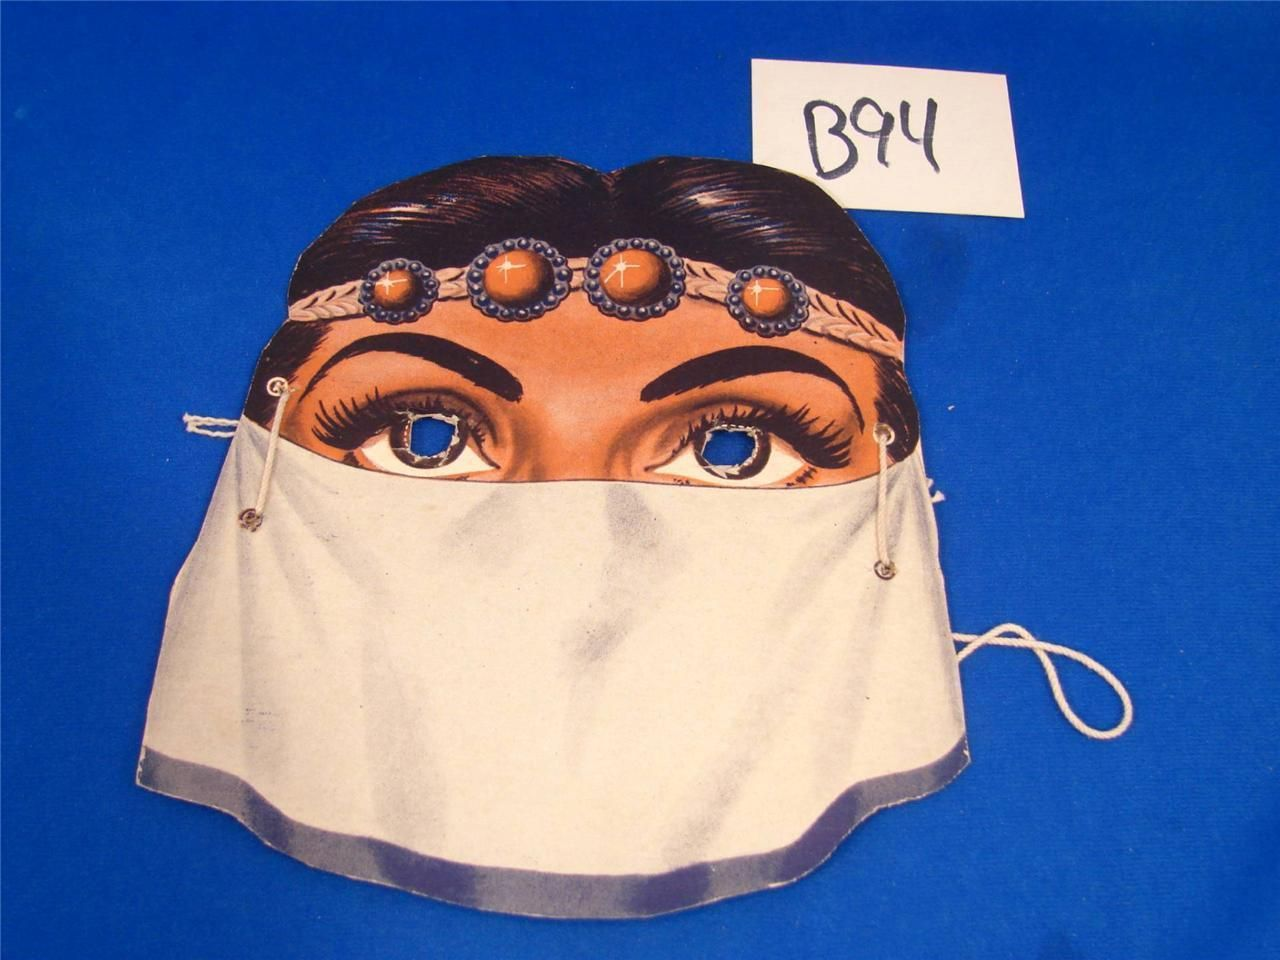 b94 vintage wheaties cereal box premium halloween mask jeanie arabian princess - Premium Halloween Masks